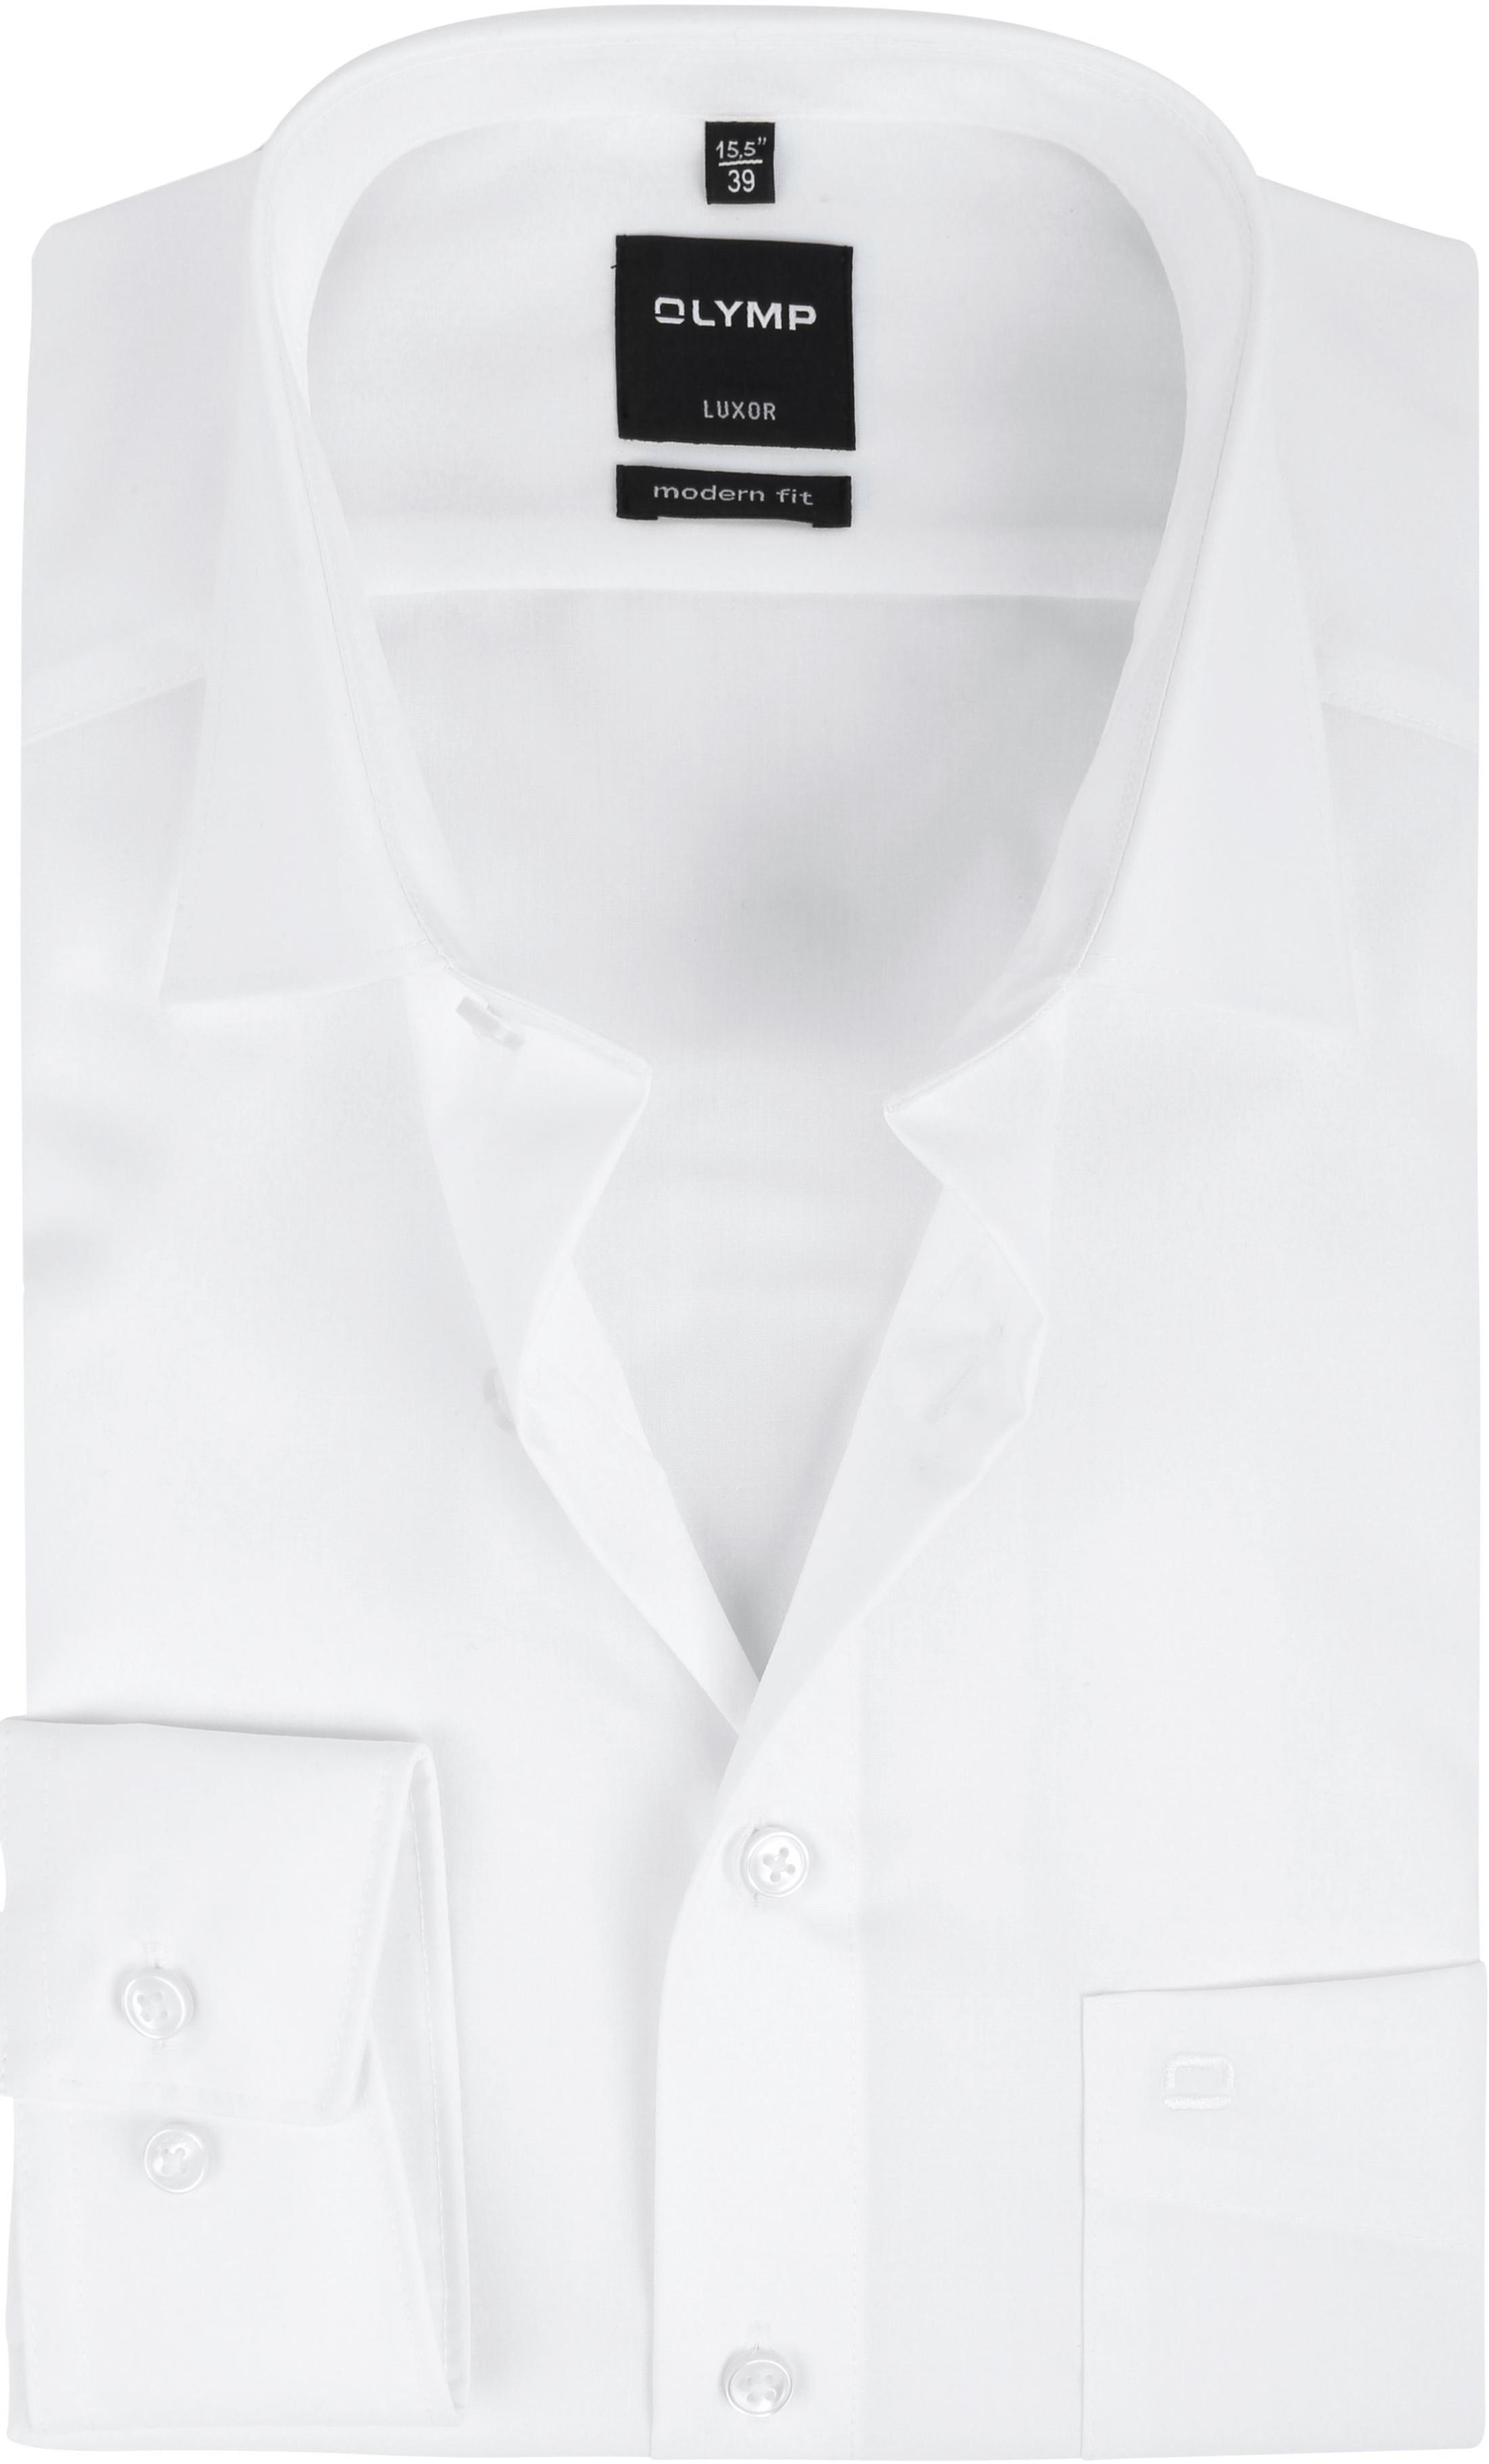 Olymp Overhemd Wit